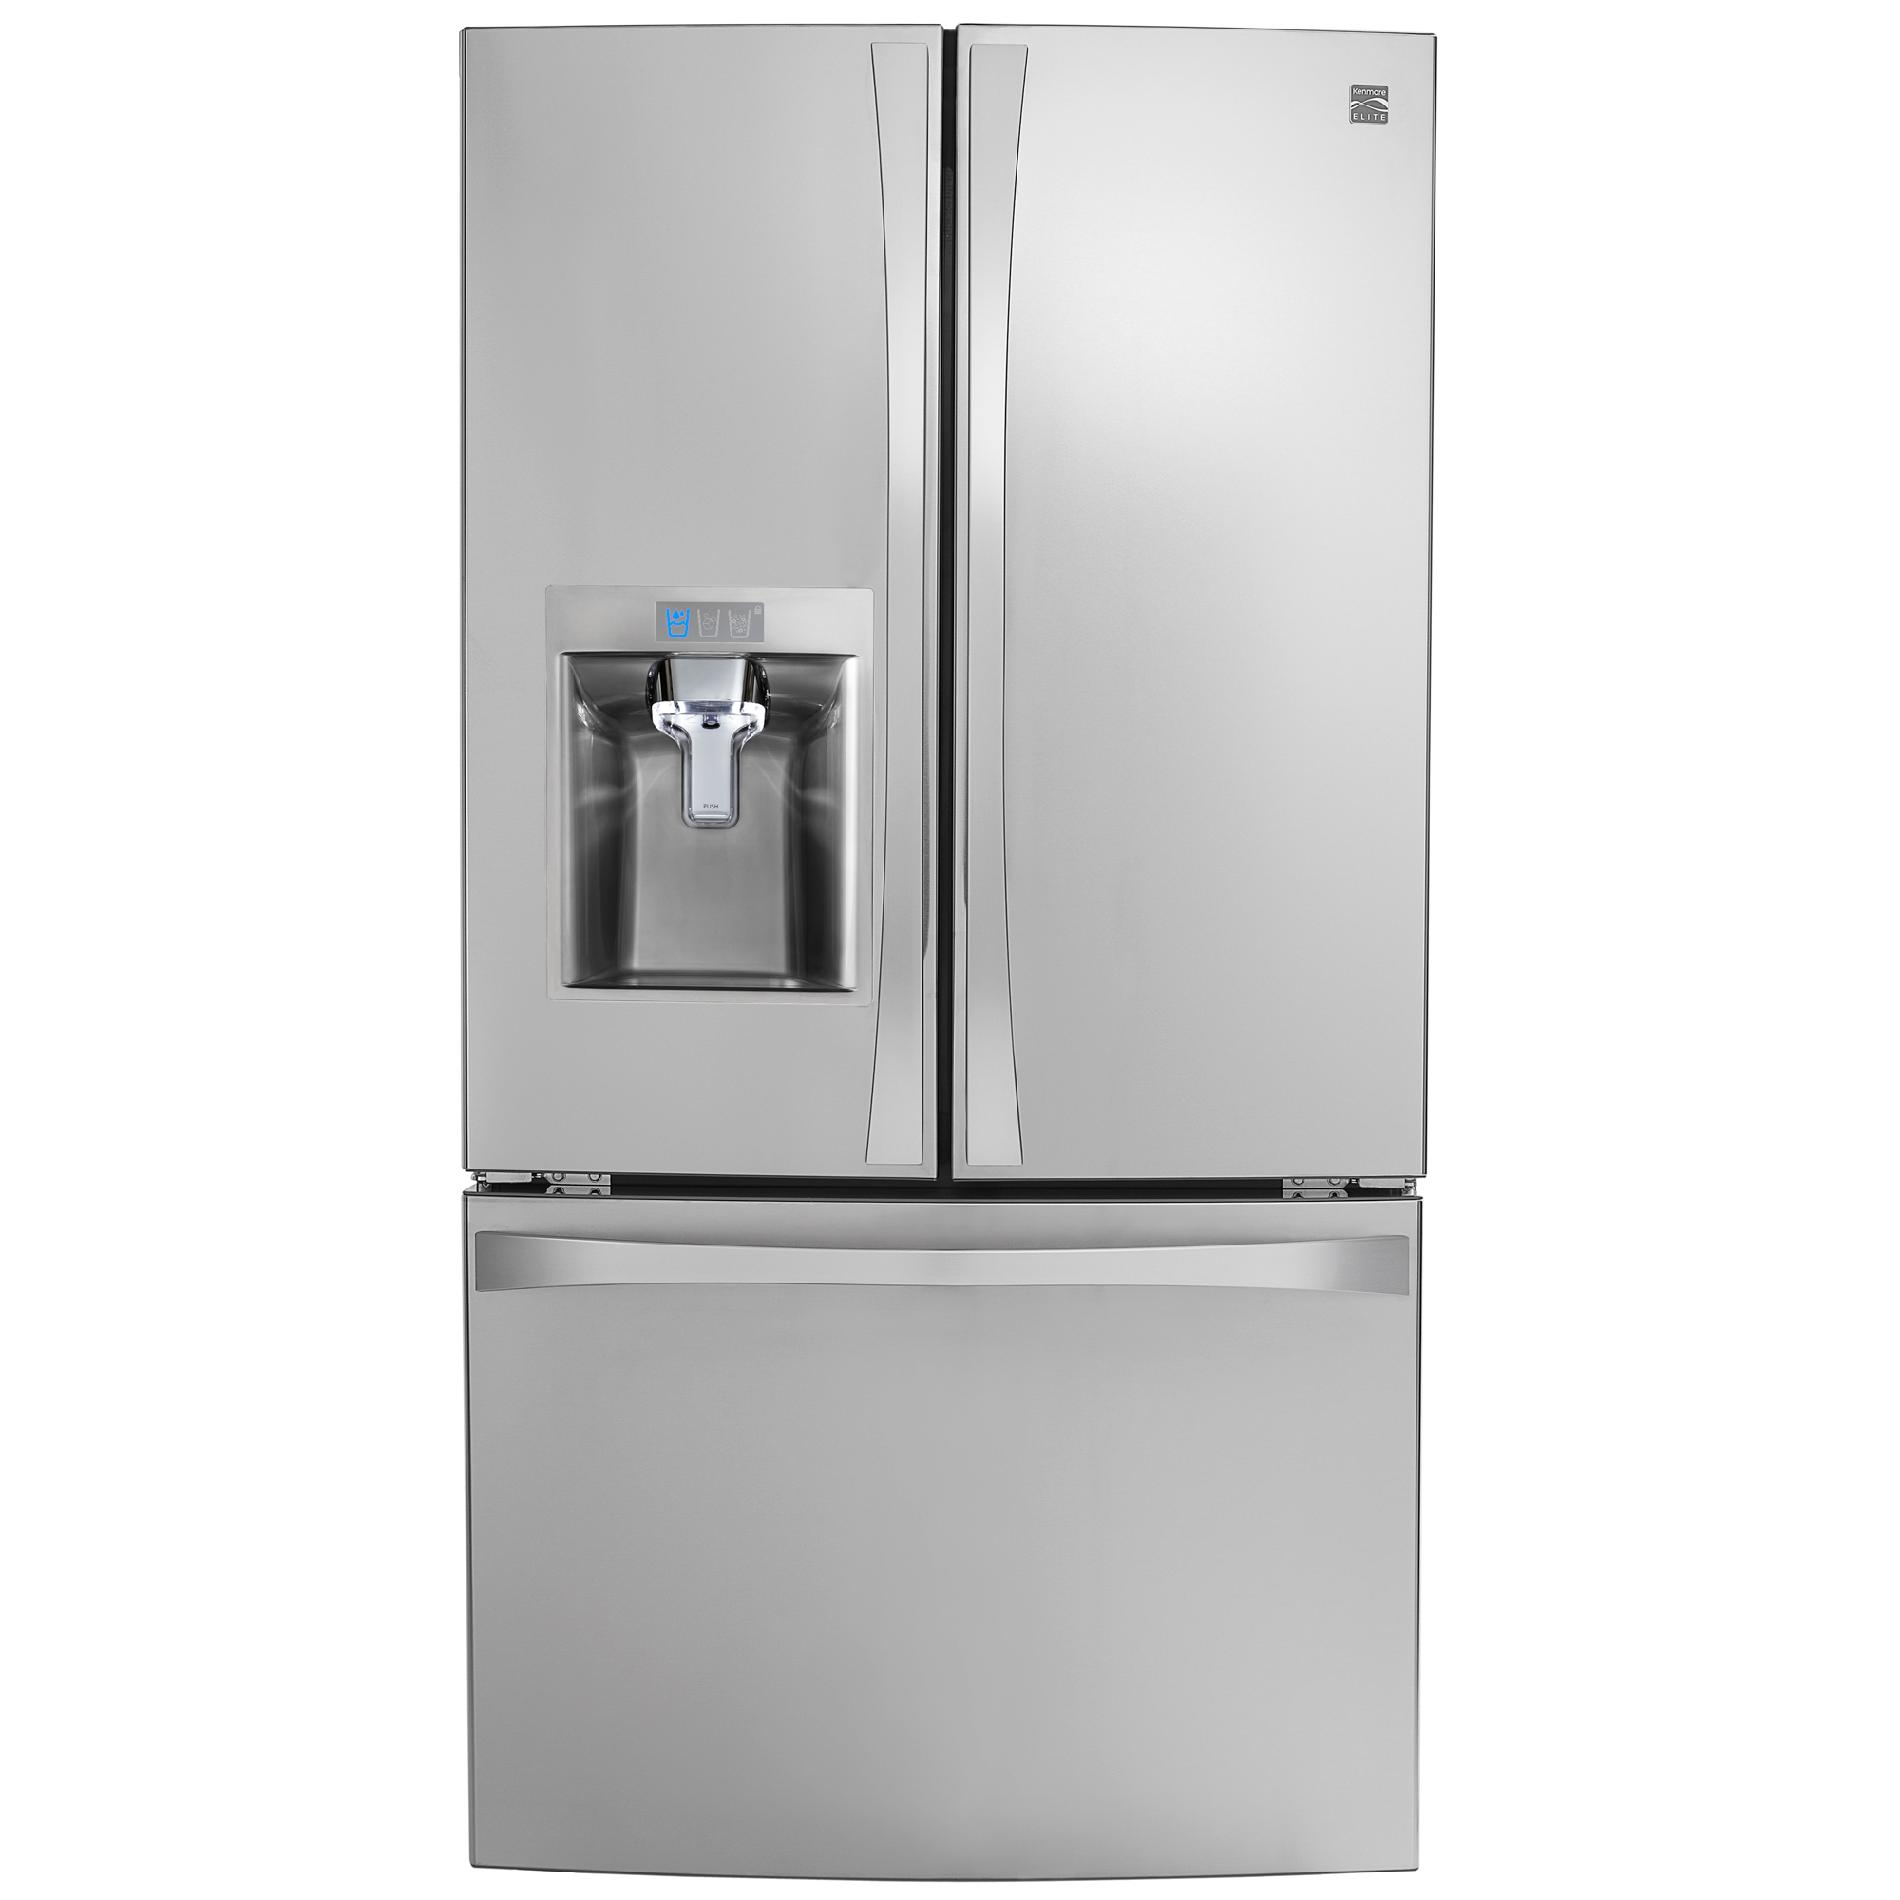 Kenmore elite 74043 23 7 cu ft french door fridge sears - Sears kitchen appliances ...